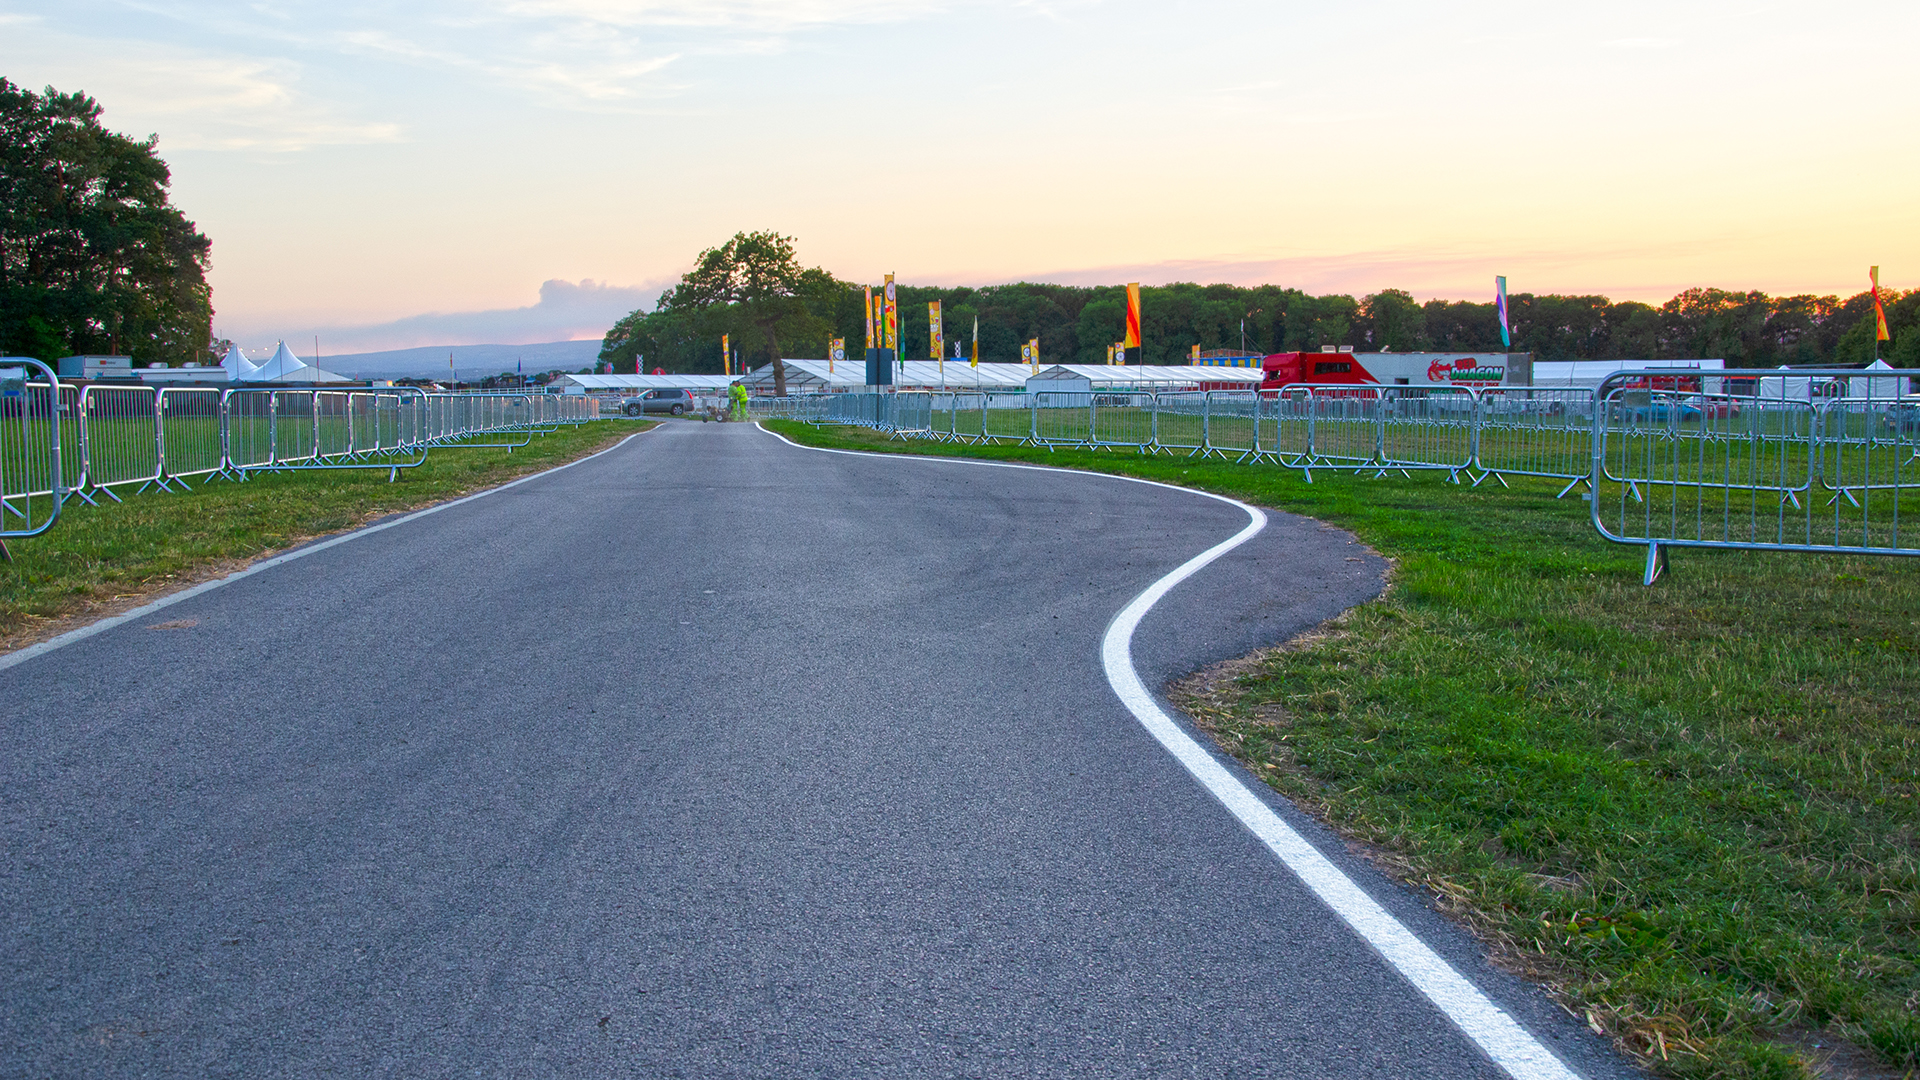 Carfest Road Marking 10